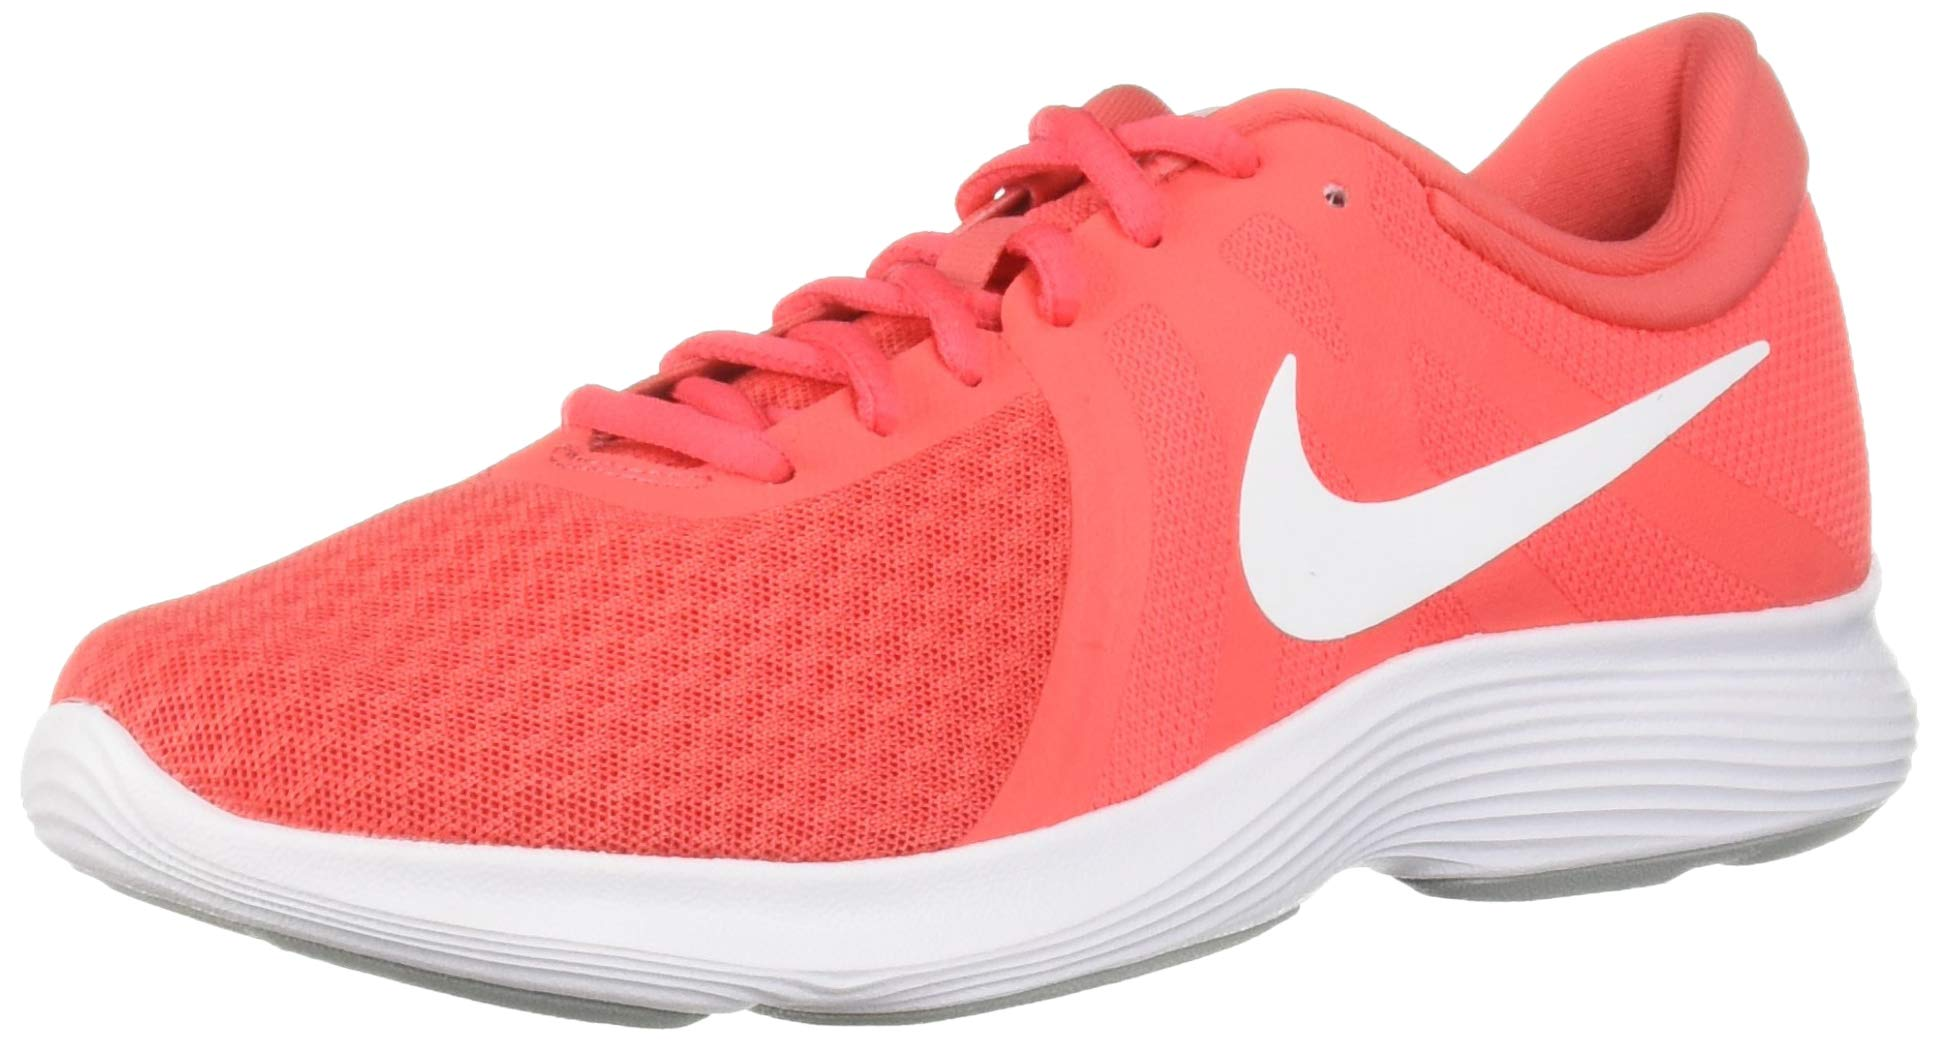 Nike Women's Revolution 4 Running Shoe, Ember Glow/White - Pink Glaze, 5 Regular US